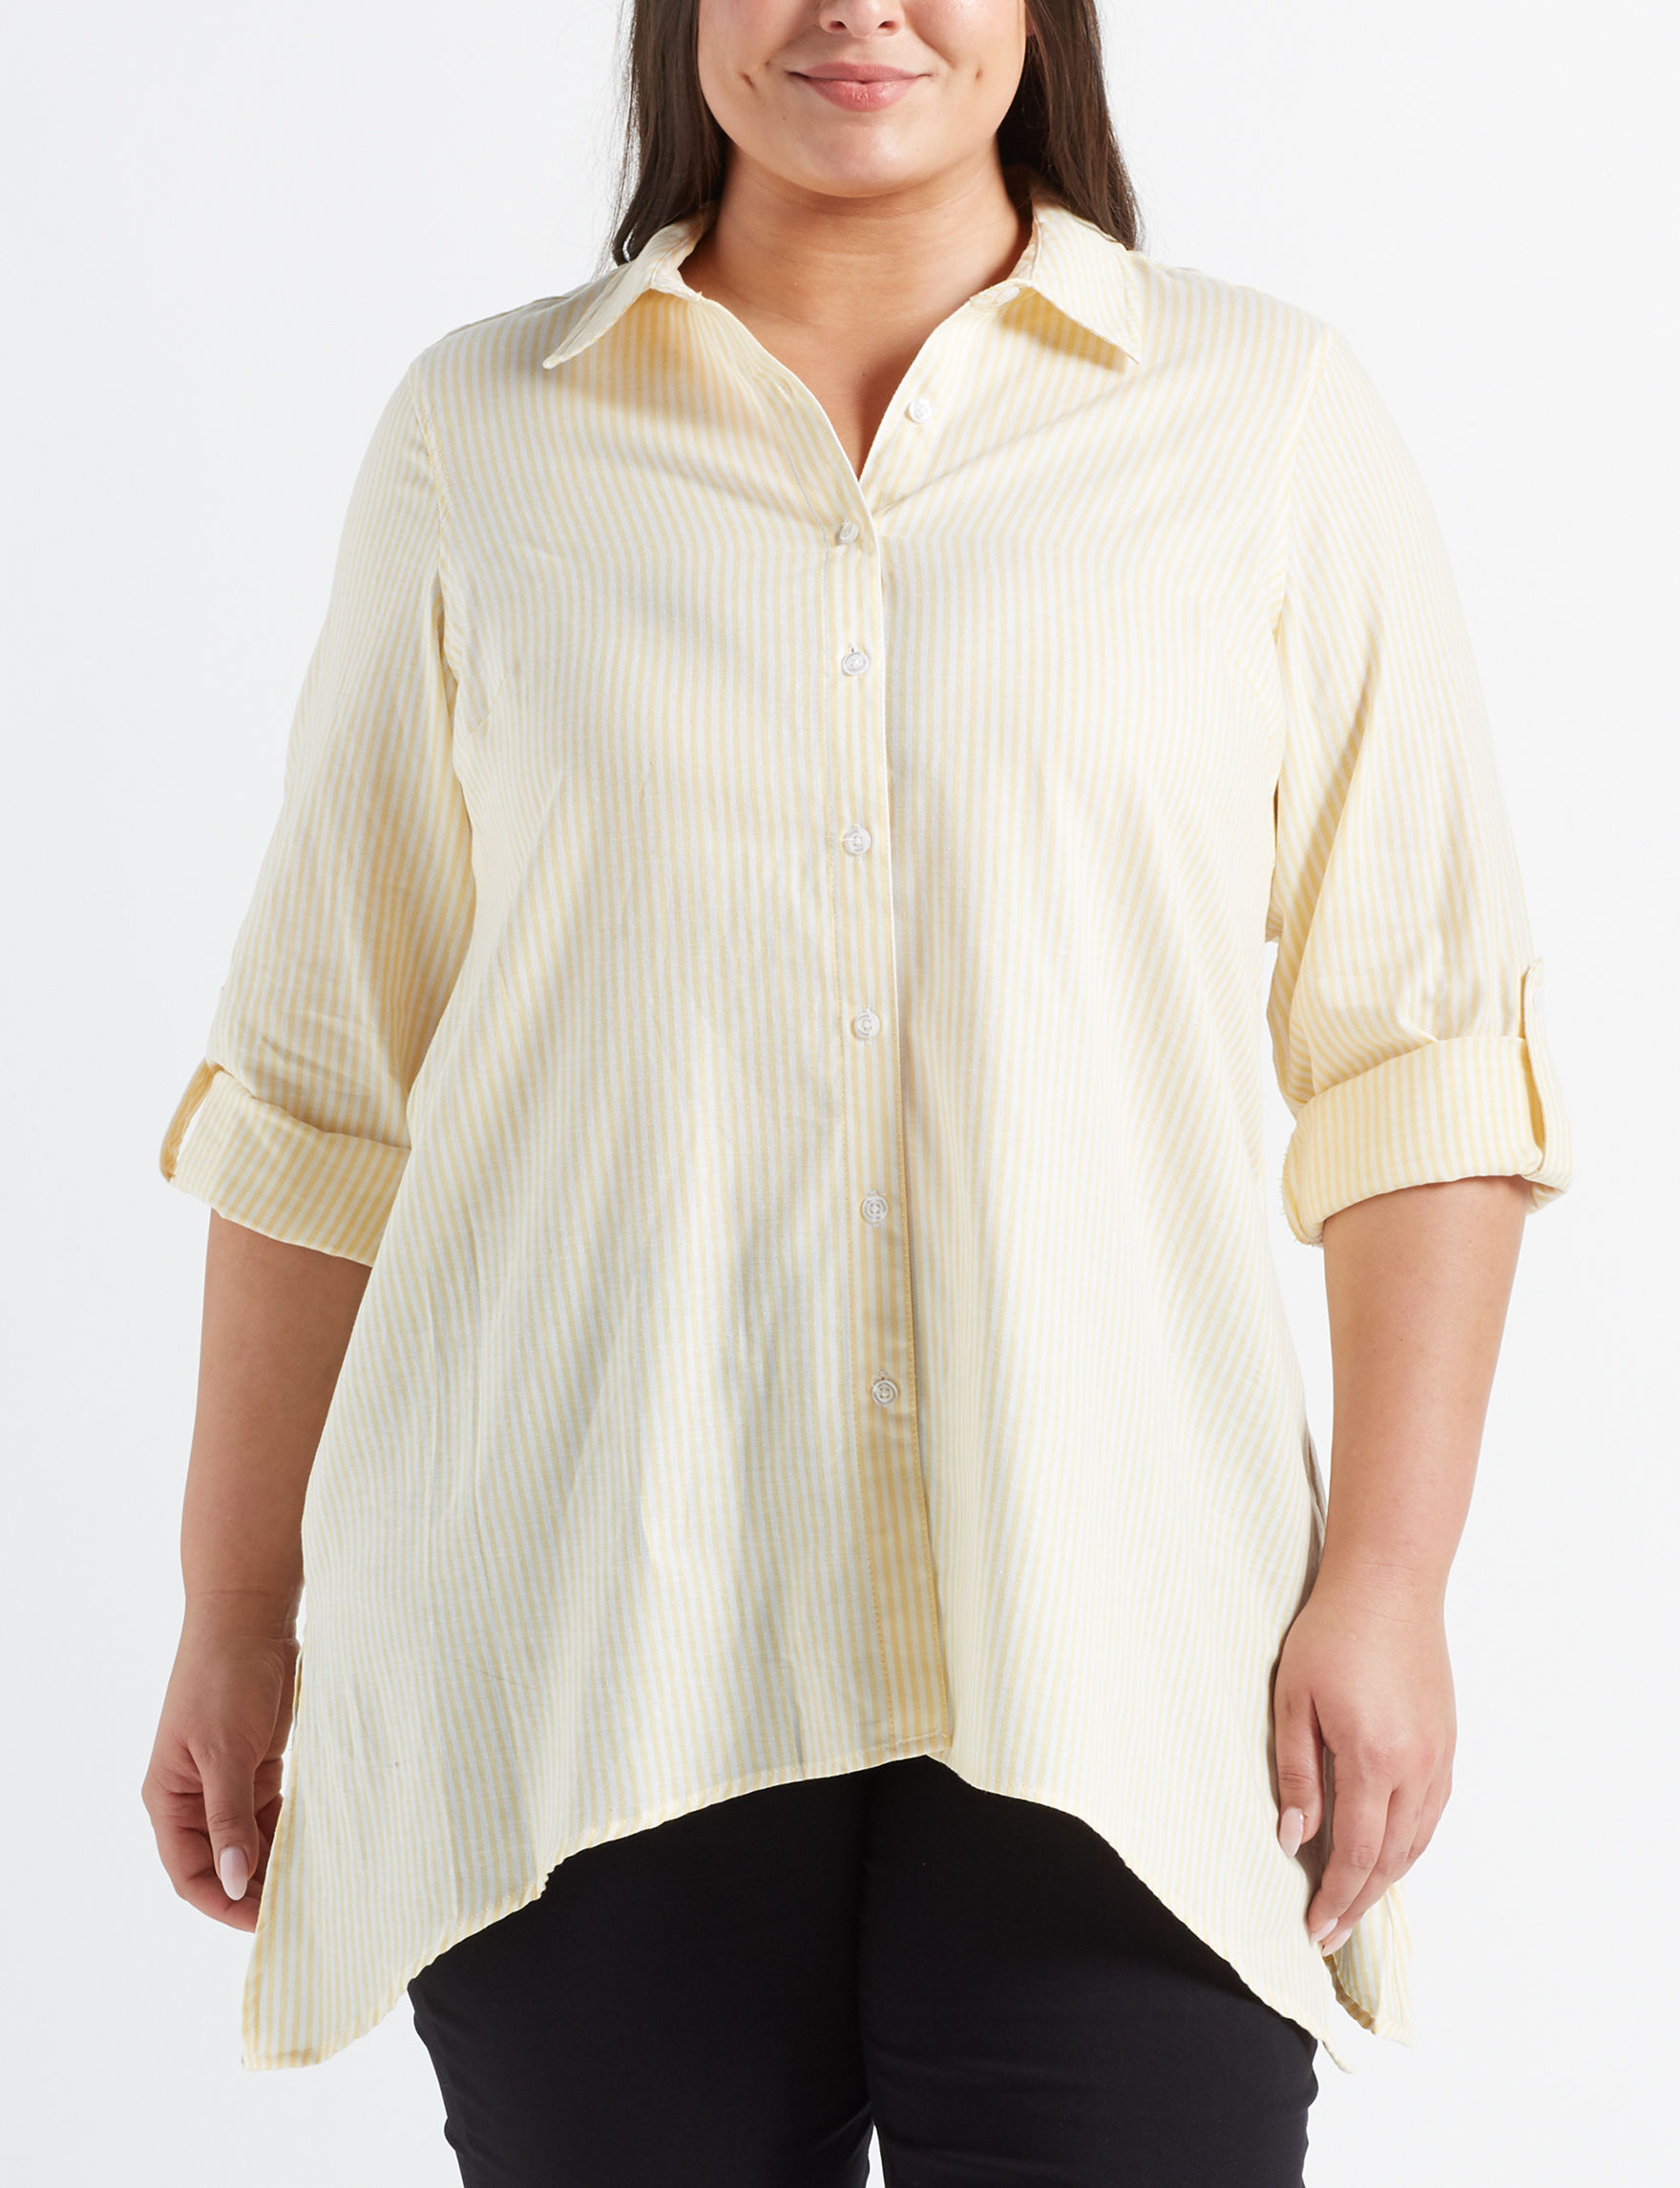 Zac & Rachel Yellow / White Shirts & Blouses